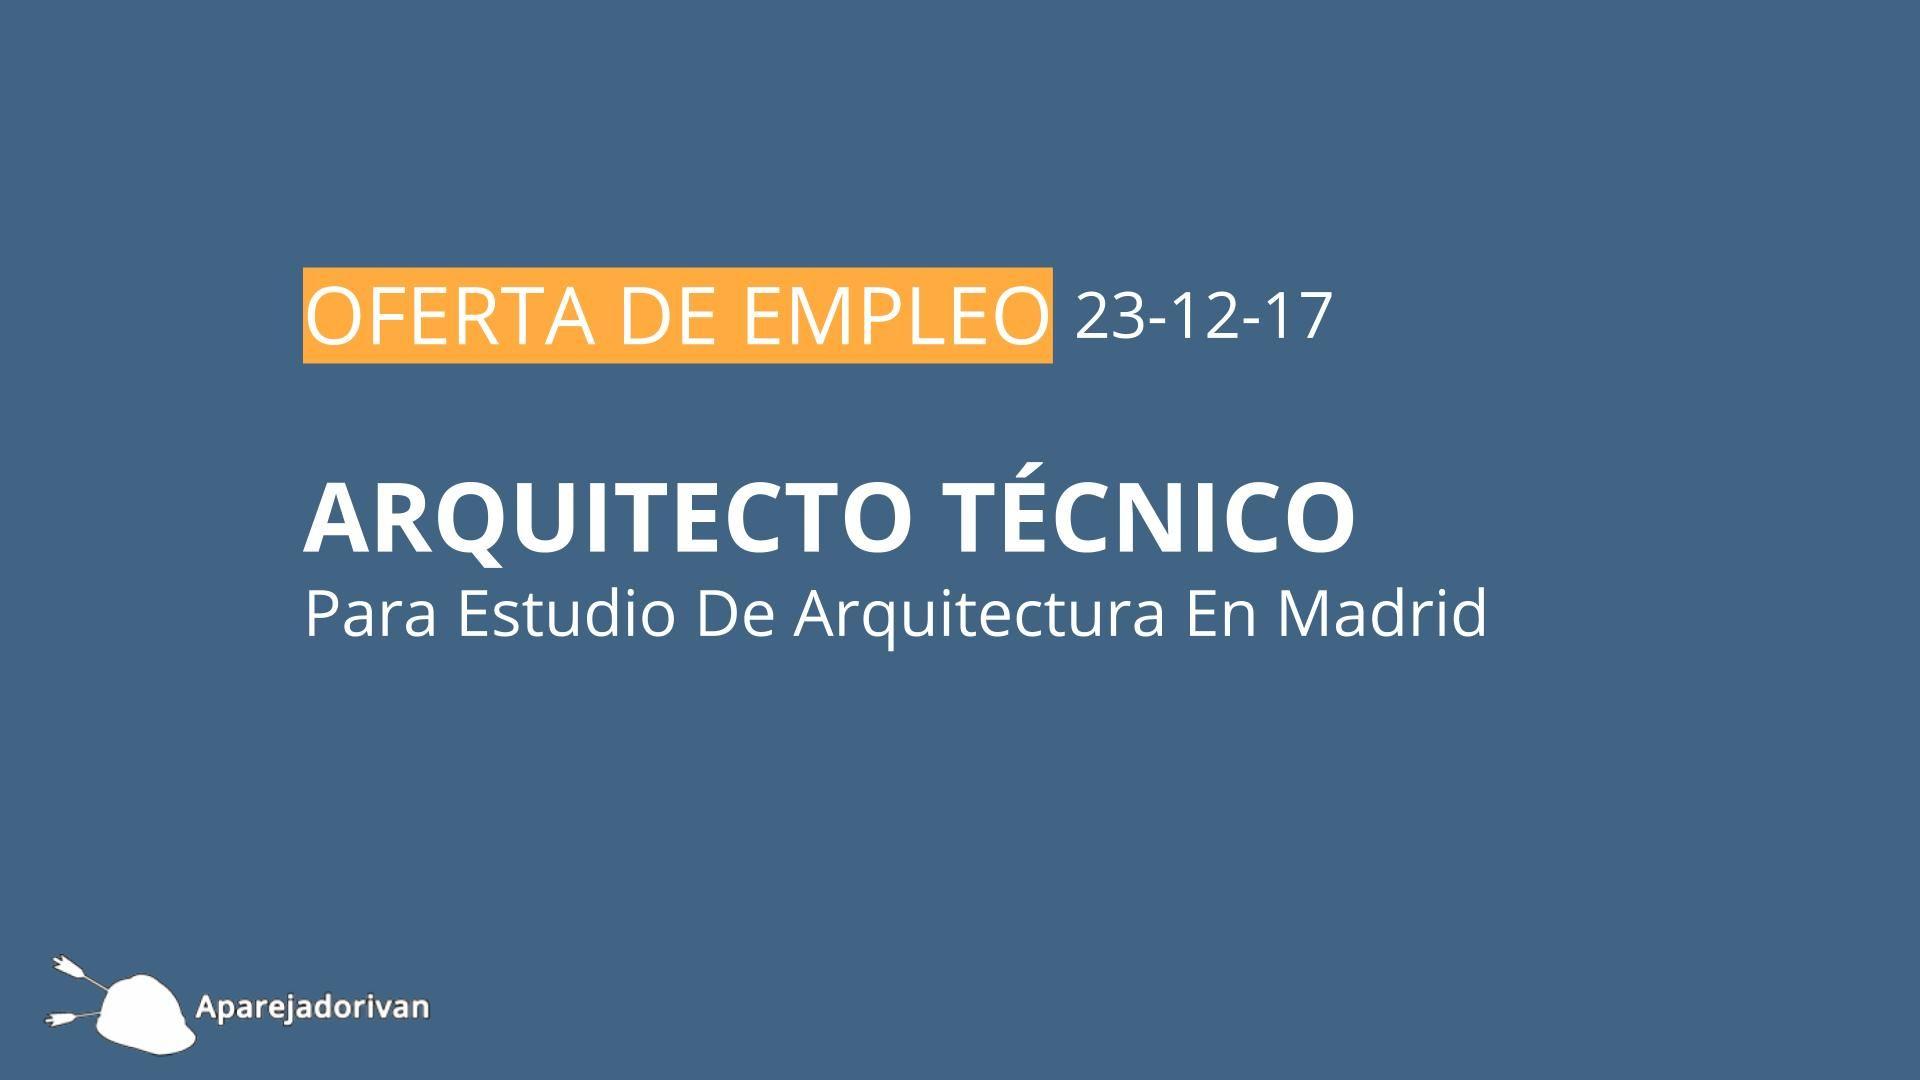 oferta empleo arquitecto técnico en madrid